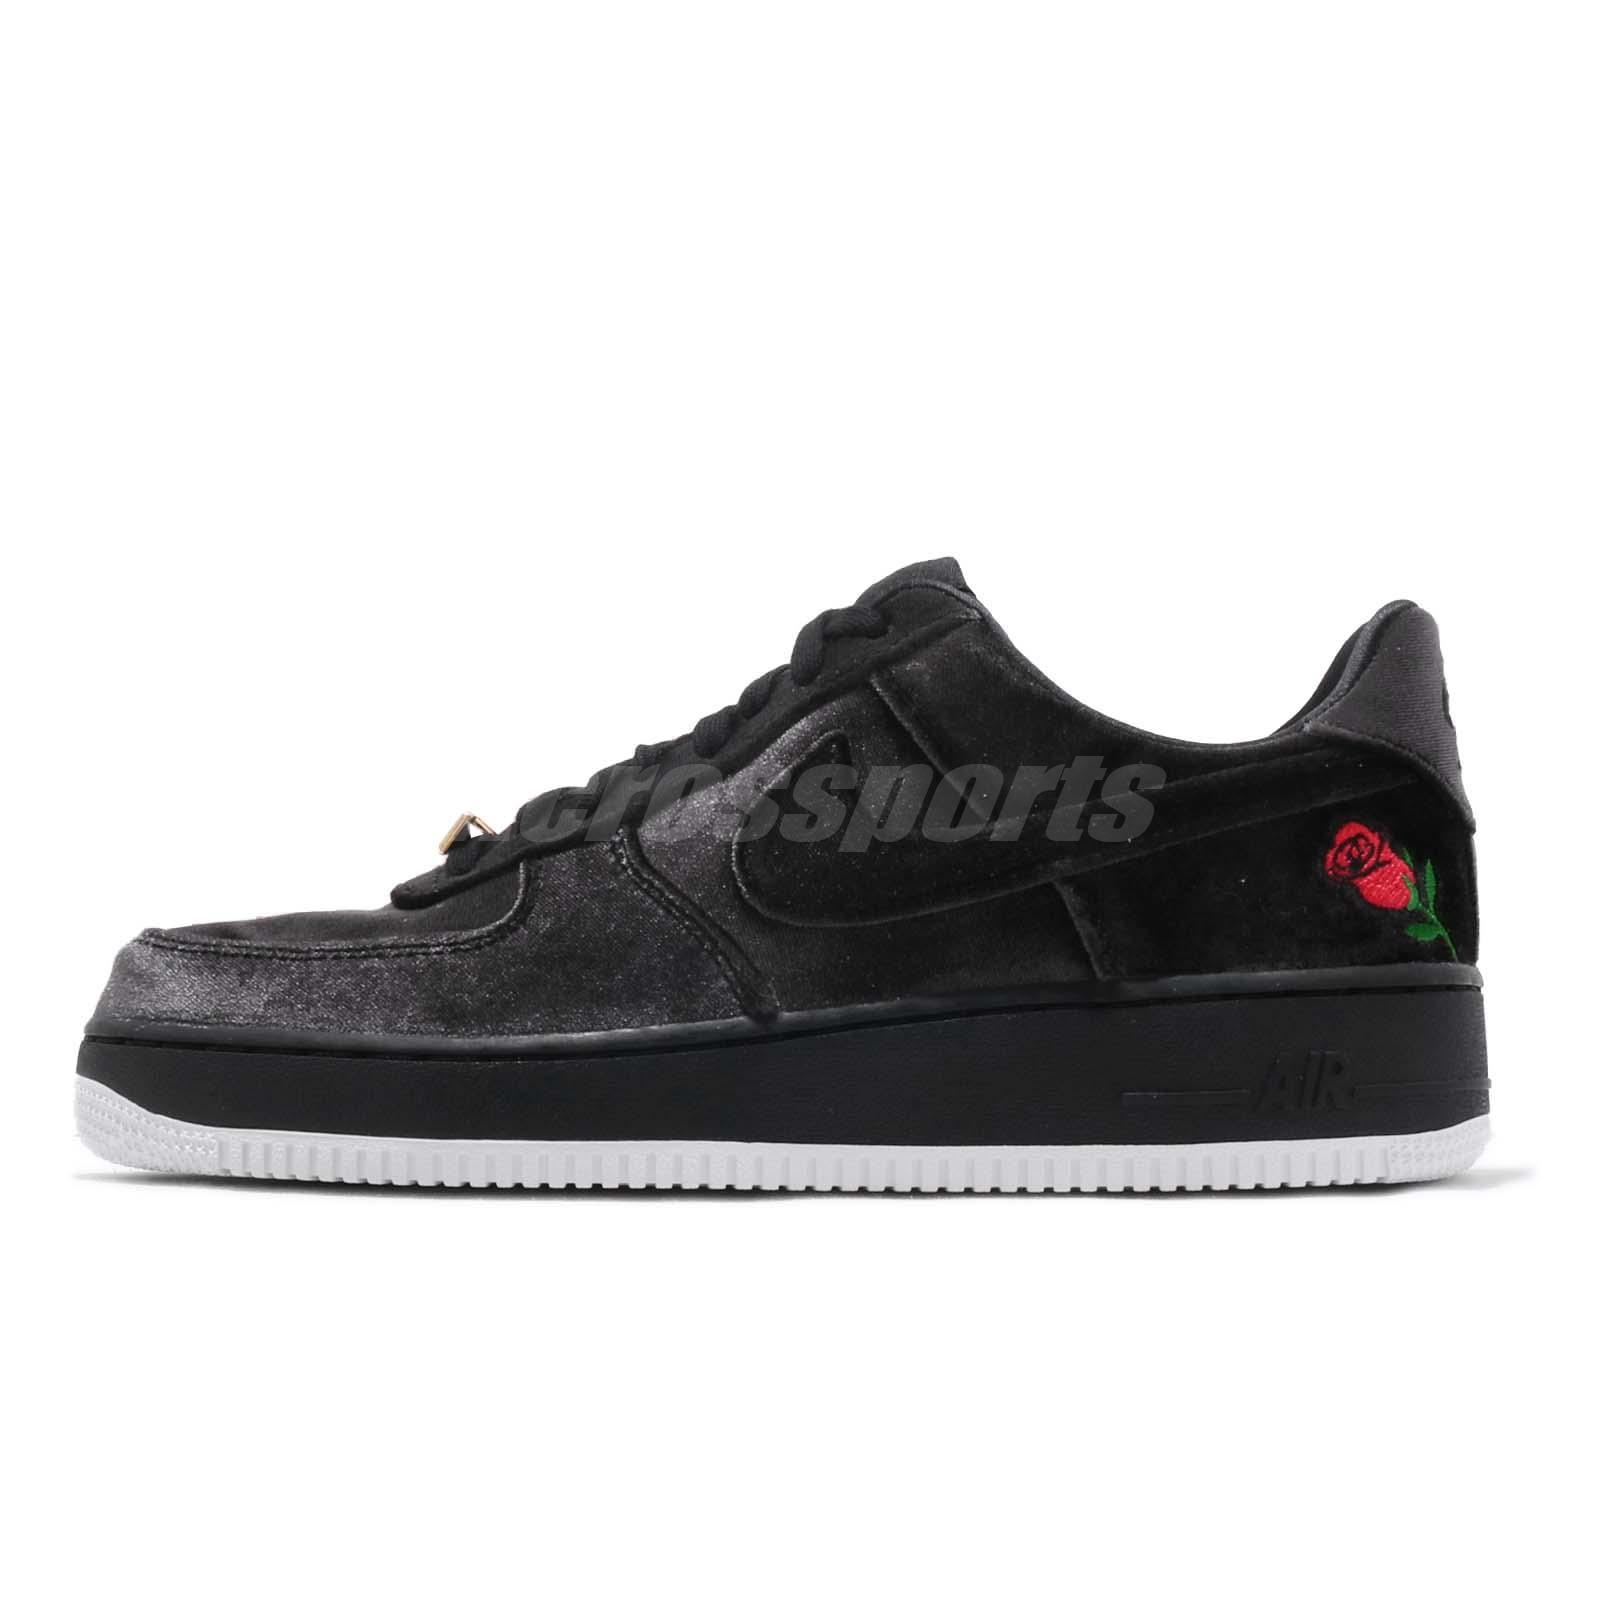 new style 98da8 3a1b0 Nike Air Force 1 07 QS Black Velvet Rose Mens AF1 Shoes Sneakers AH8462-003